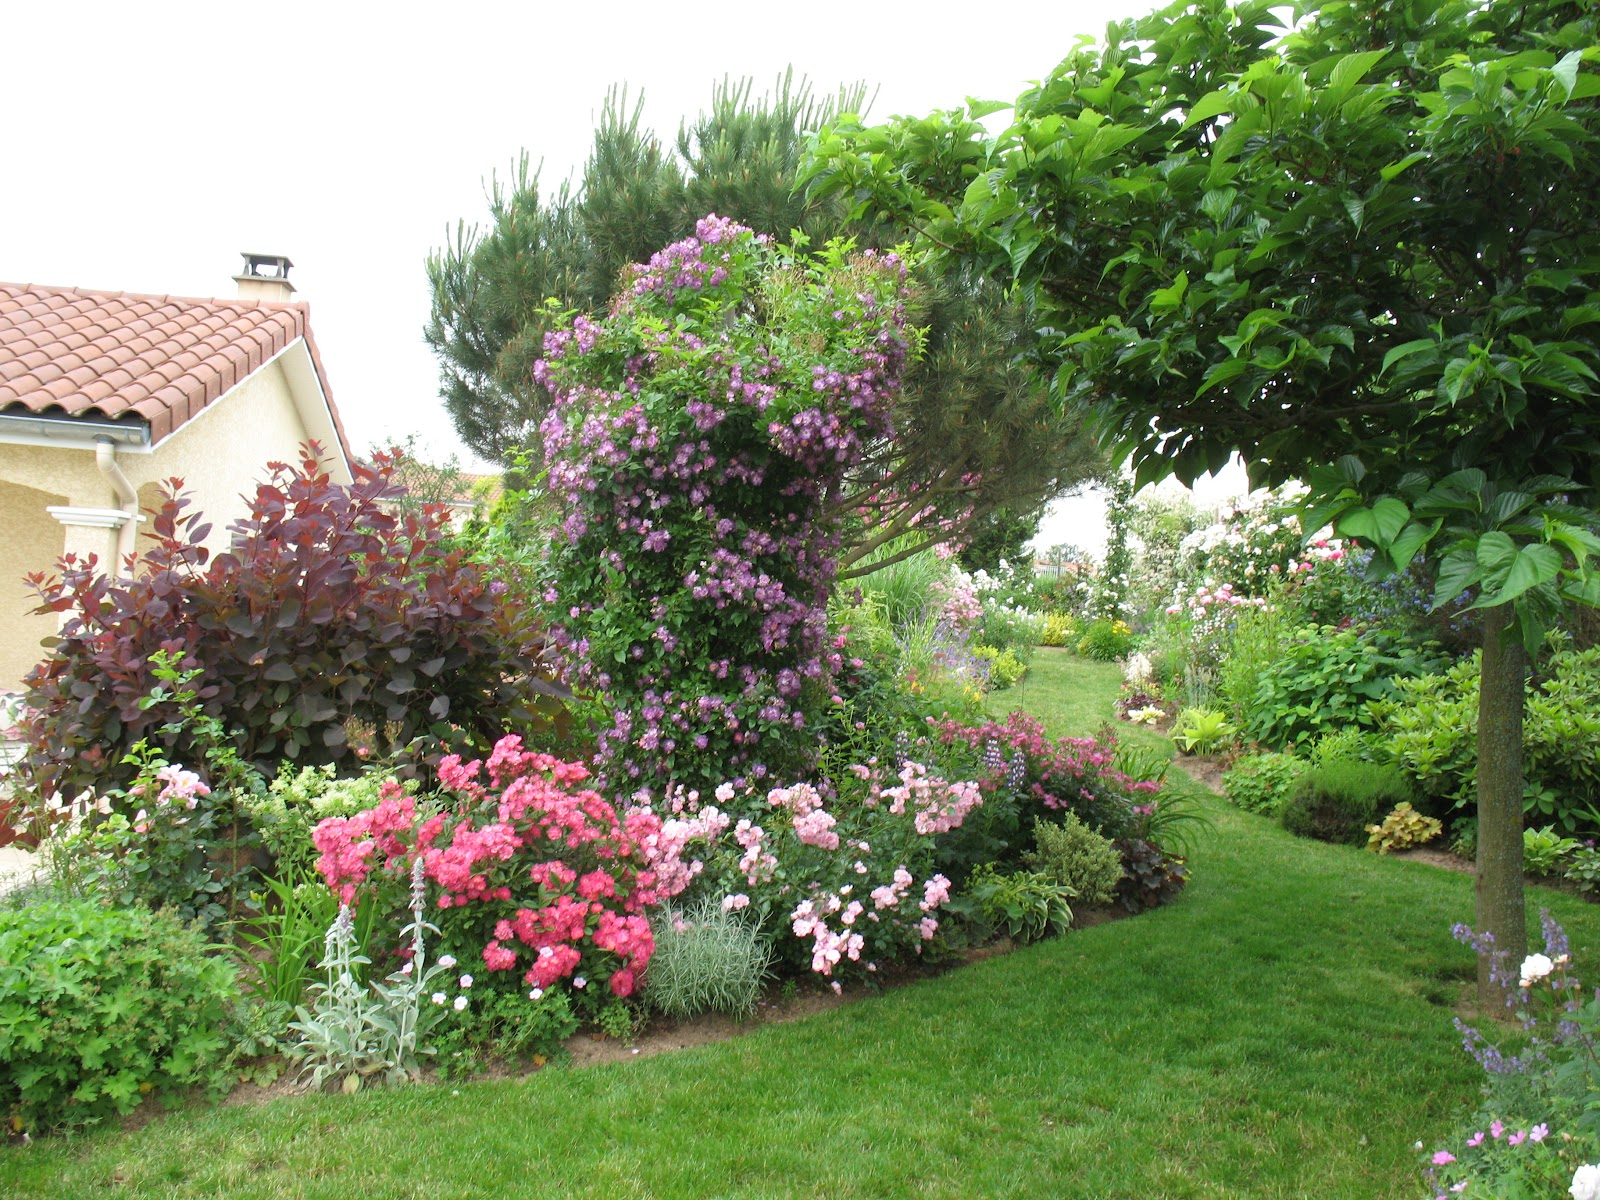 Roses du jardin ch neland rosier robin hood for Fleurir son jardin